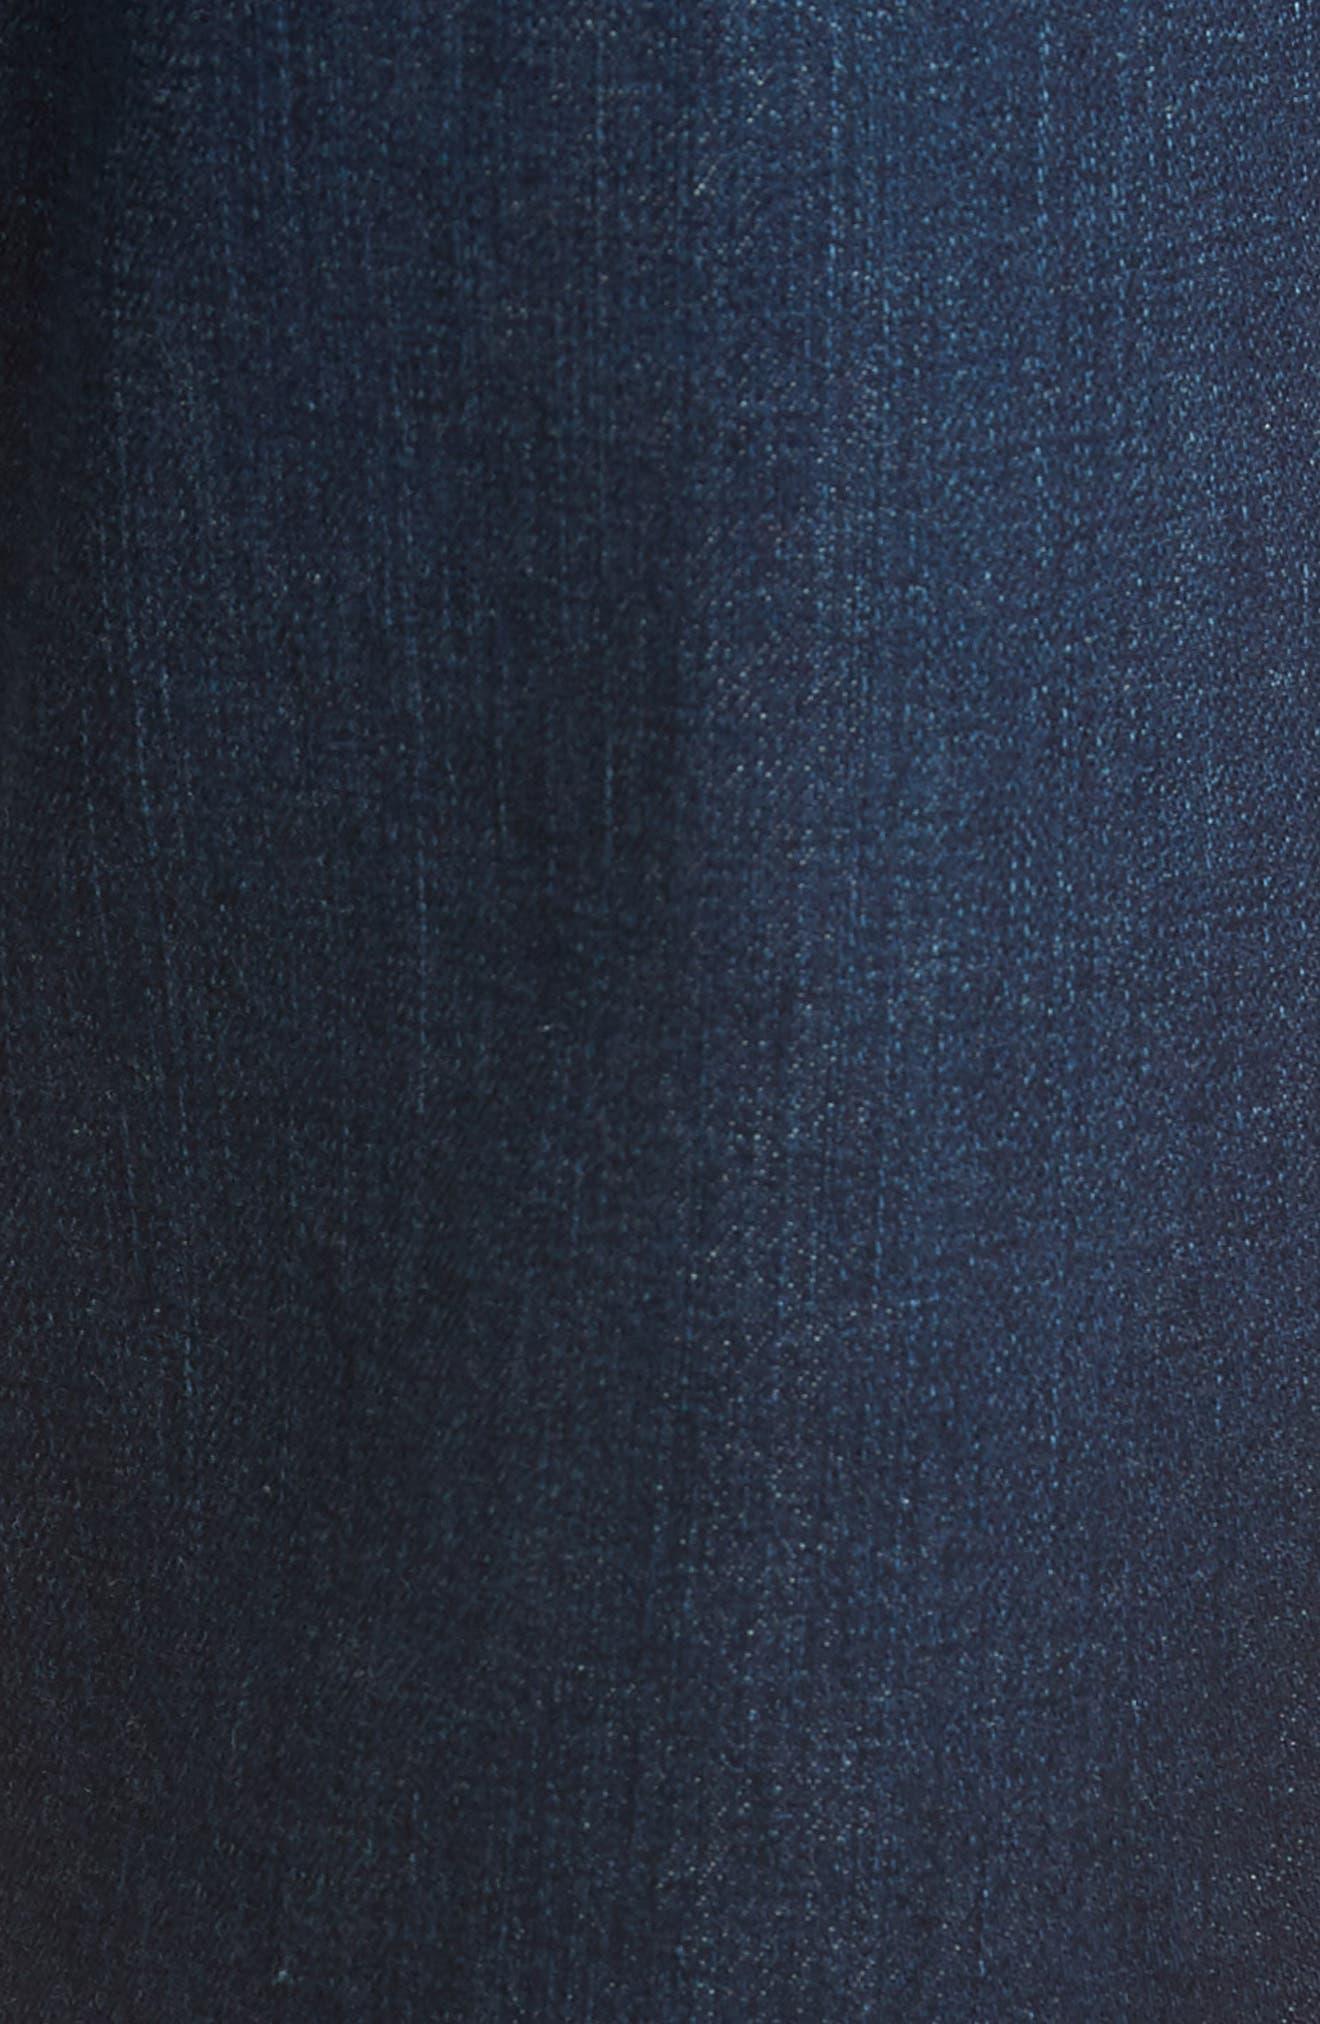 Ives Straight Leg Jeans,                             Alternate thumbnail 5, color,                             407